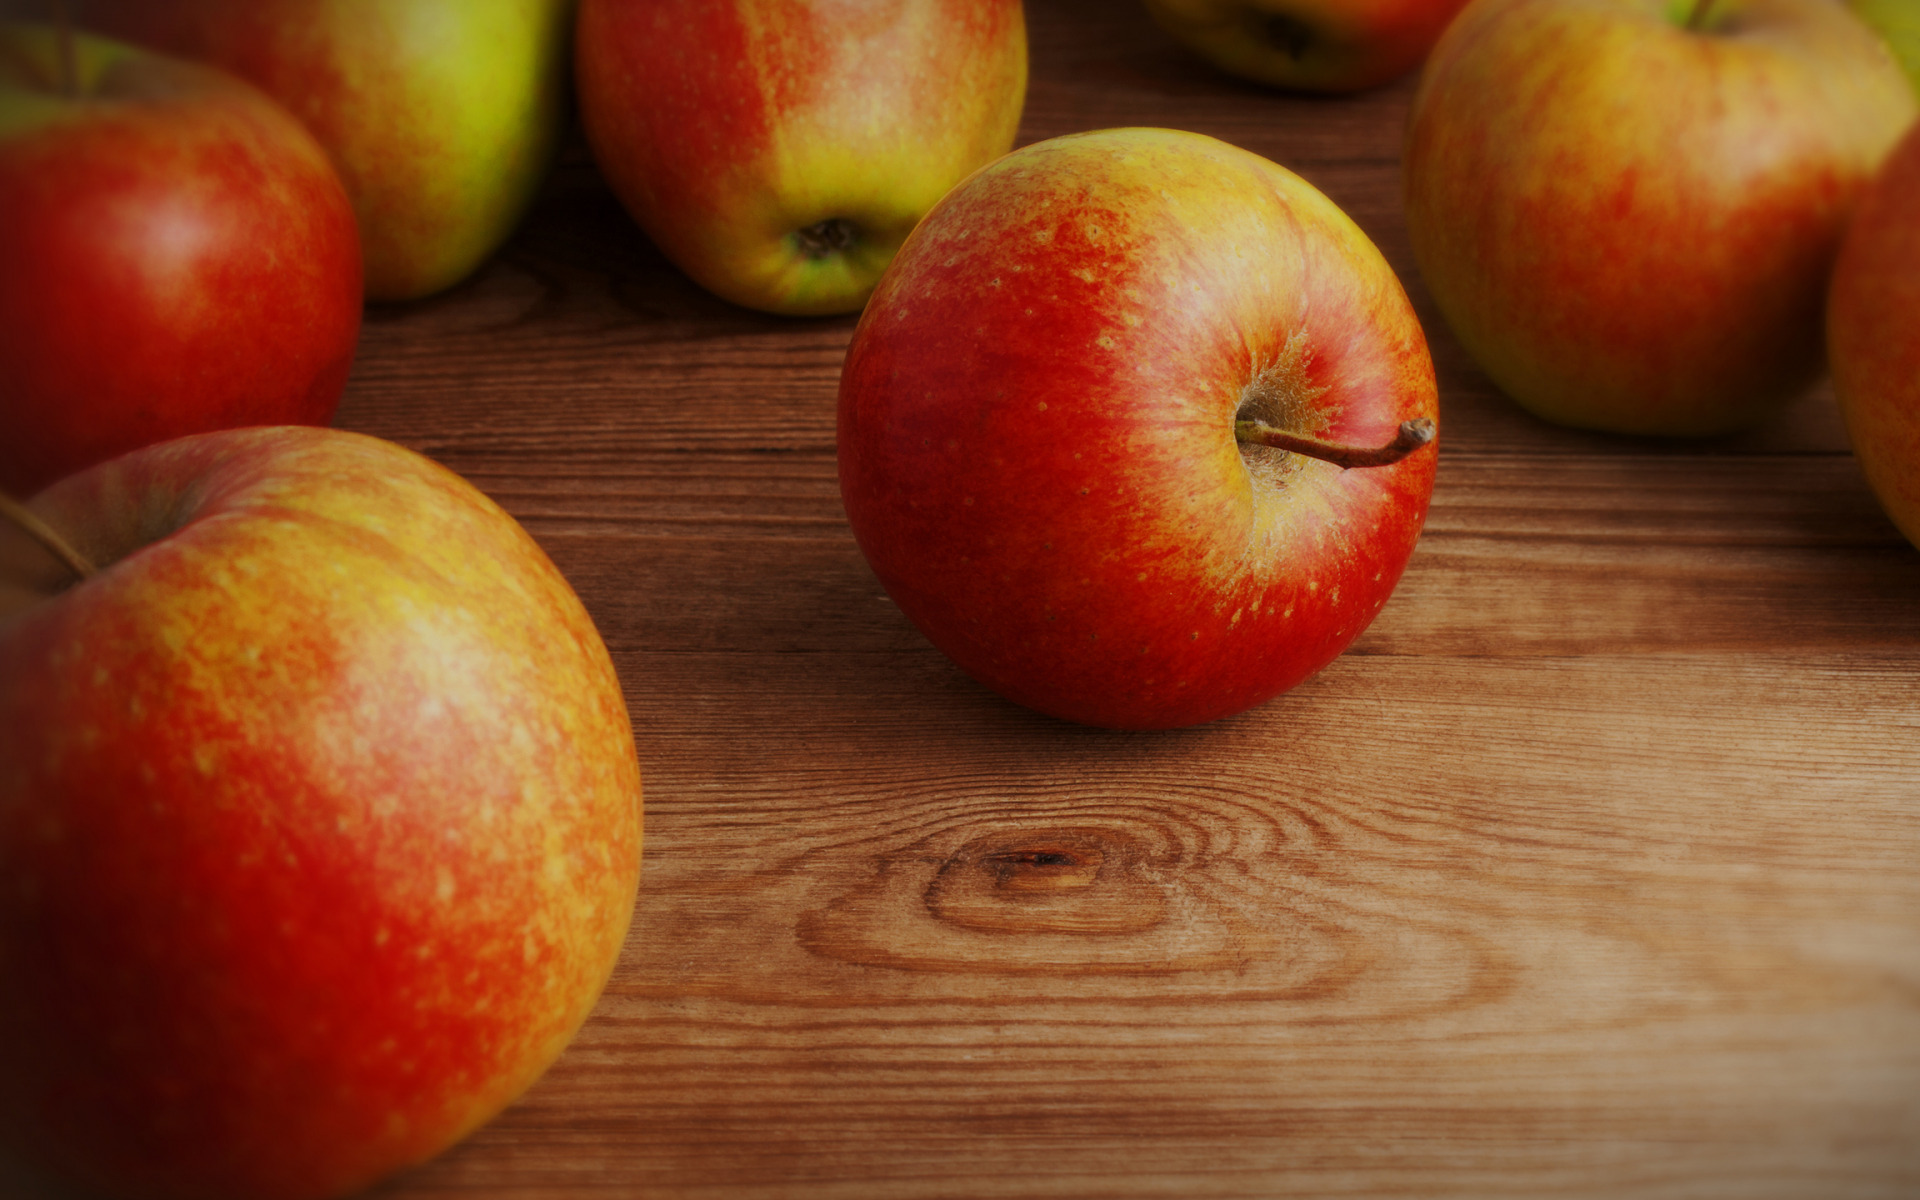 яблоки  № 164358 бесплатно